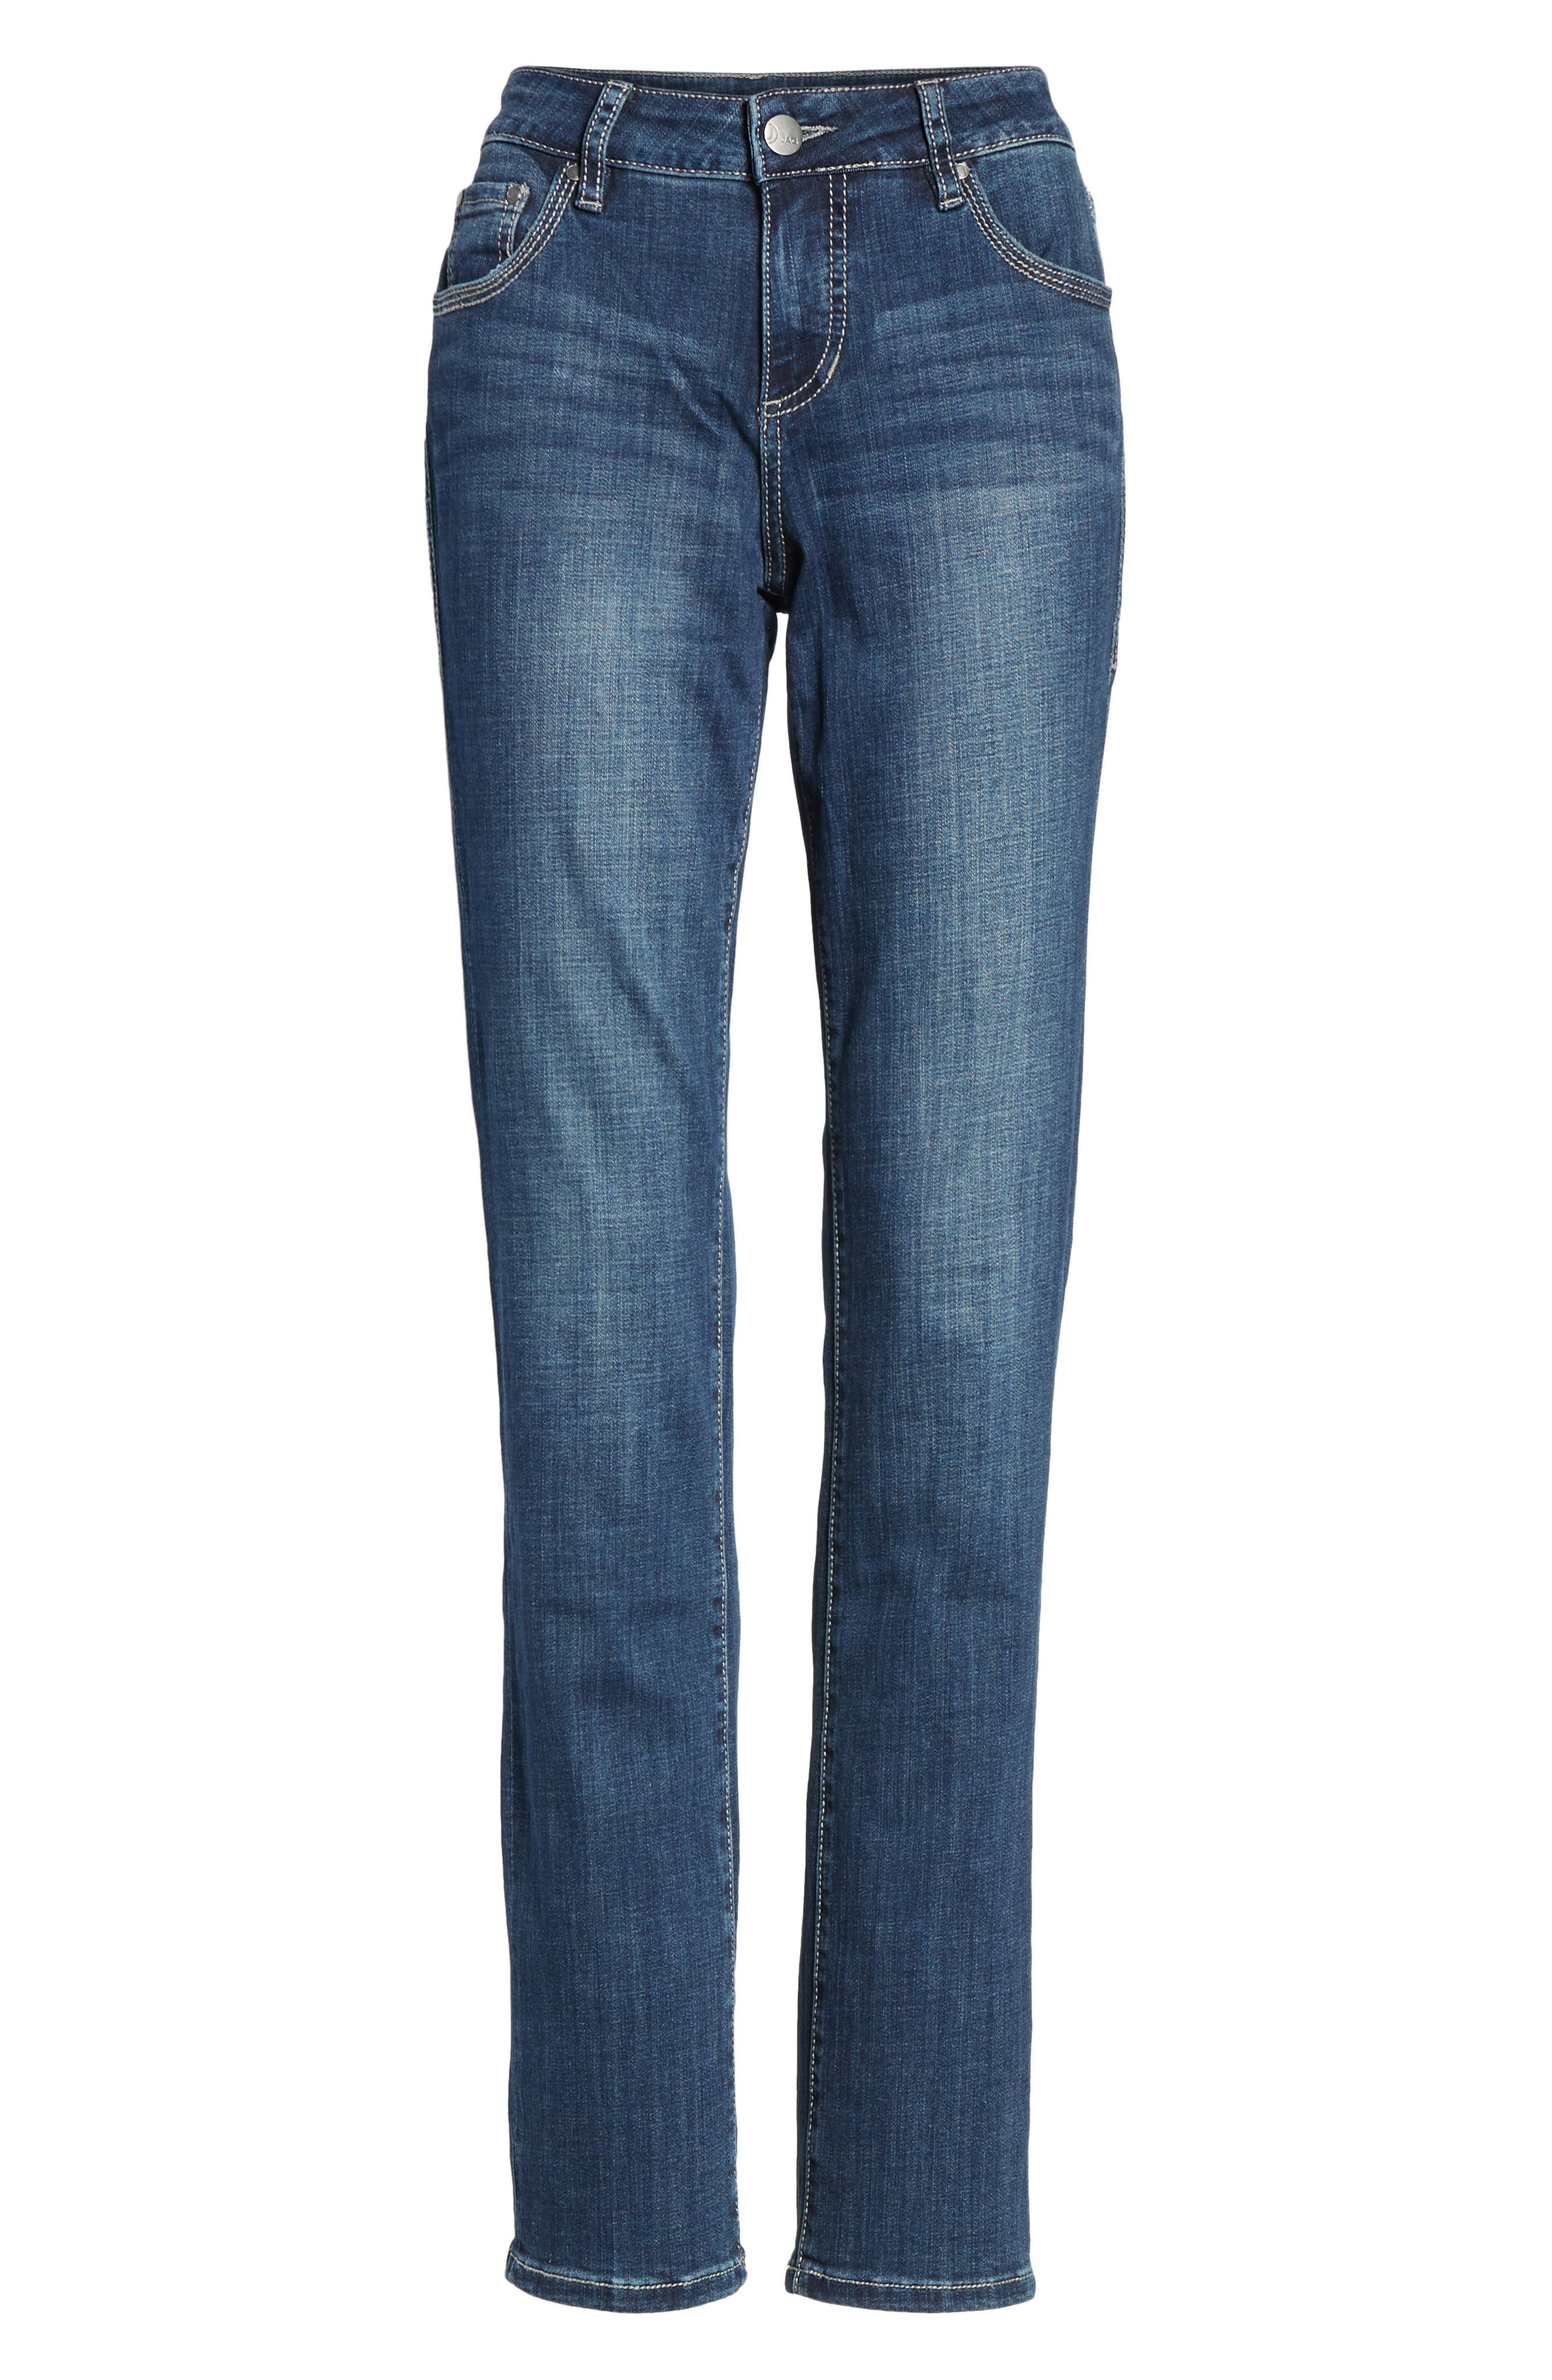 Adrian Straight Leg Jeans,                             Alternate thumbnail 6, color,